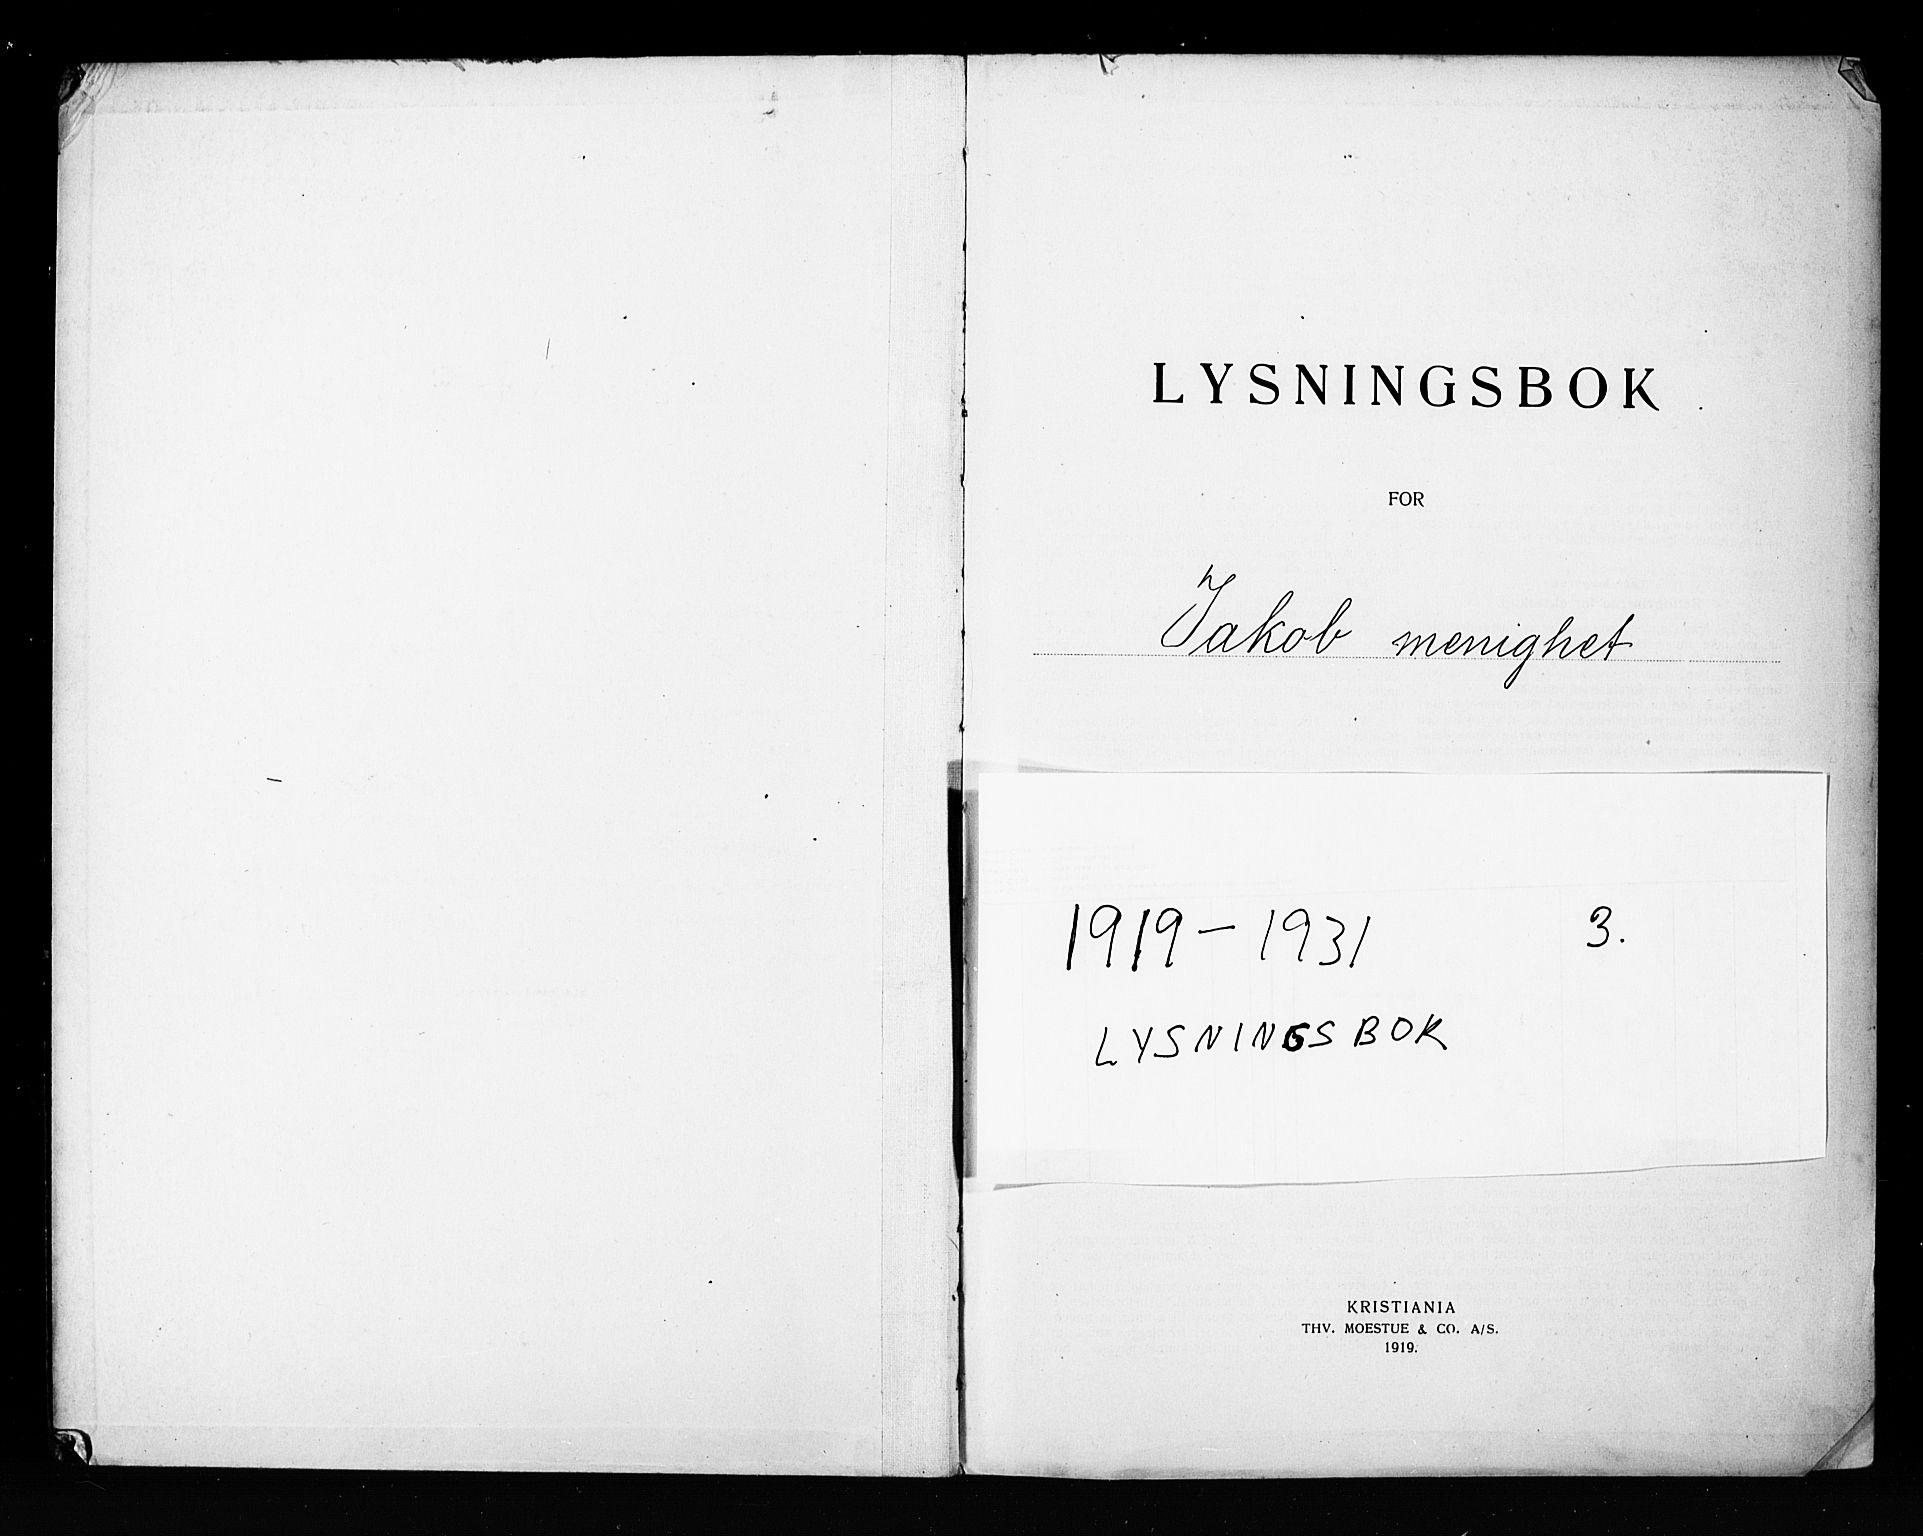 SAO, Jakob prestekontor Kirkebøker, H/Ha/L0003: Lysningsprotokoll nr. 3, 1919-1931